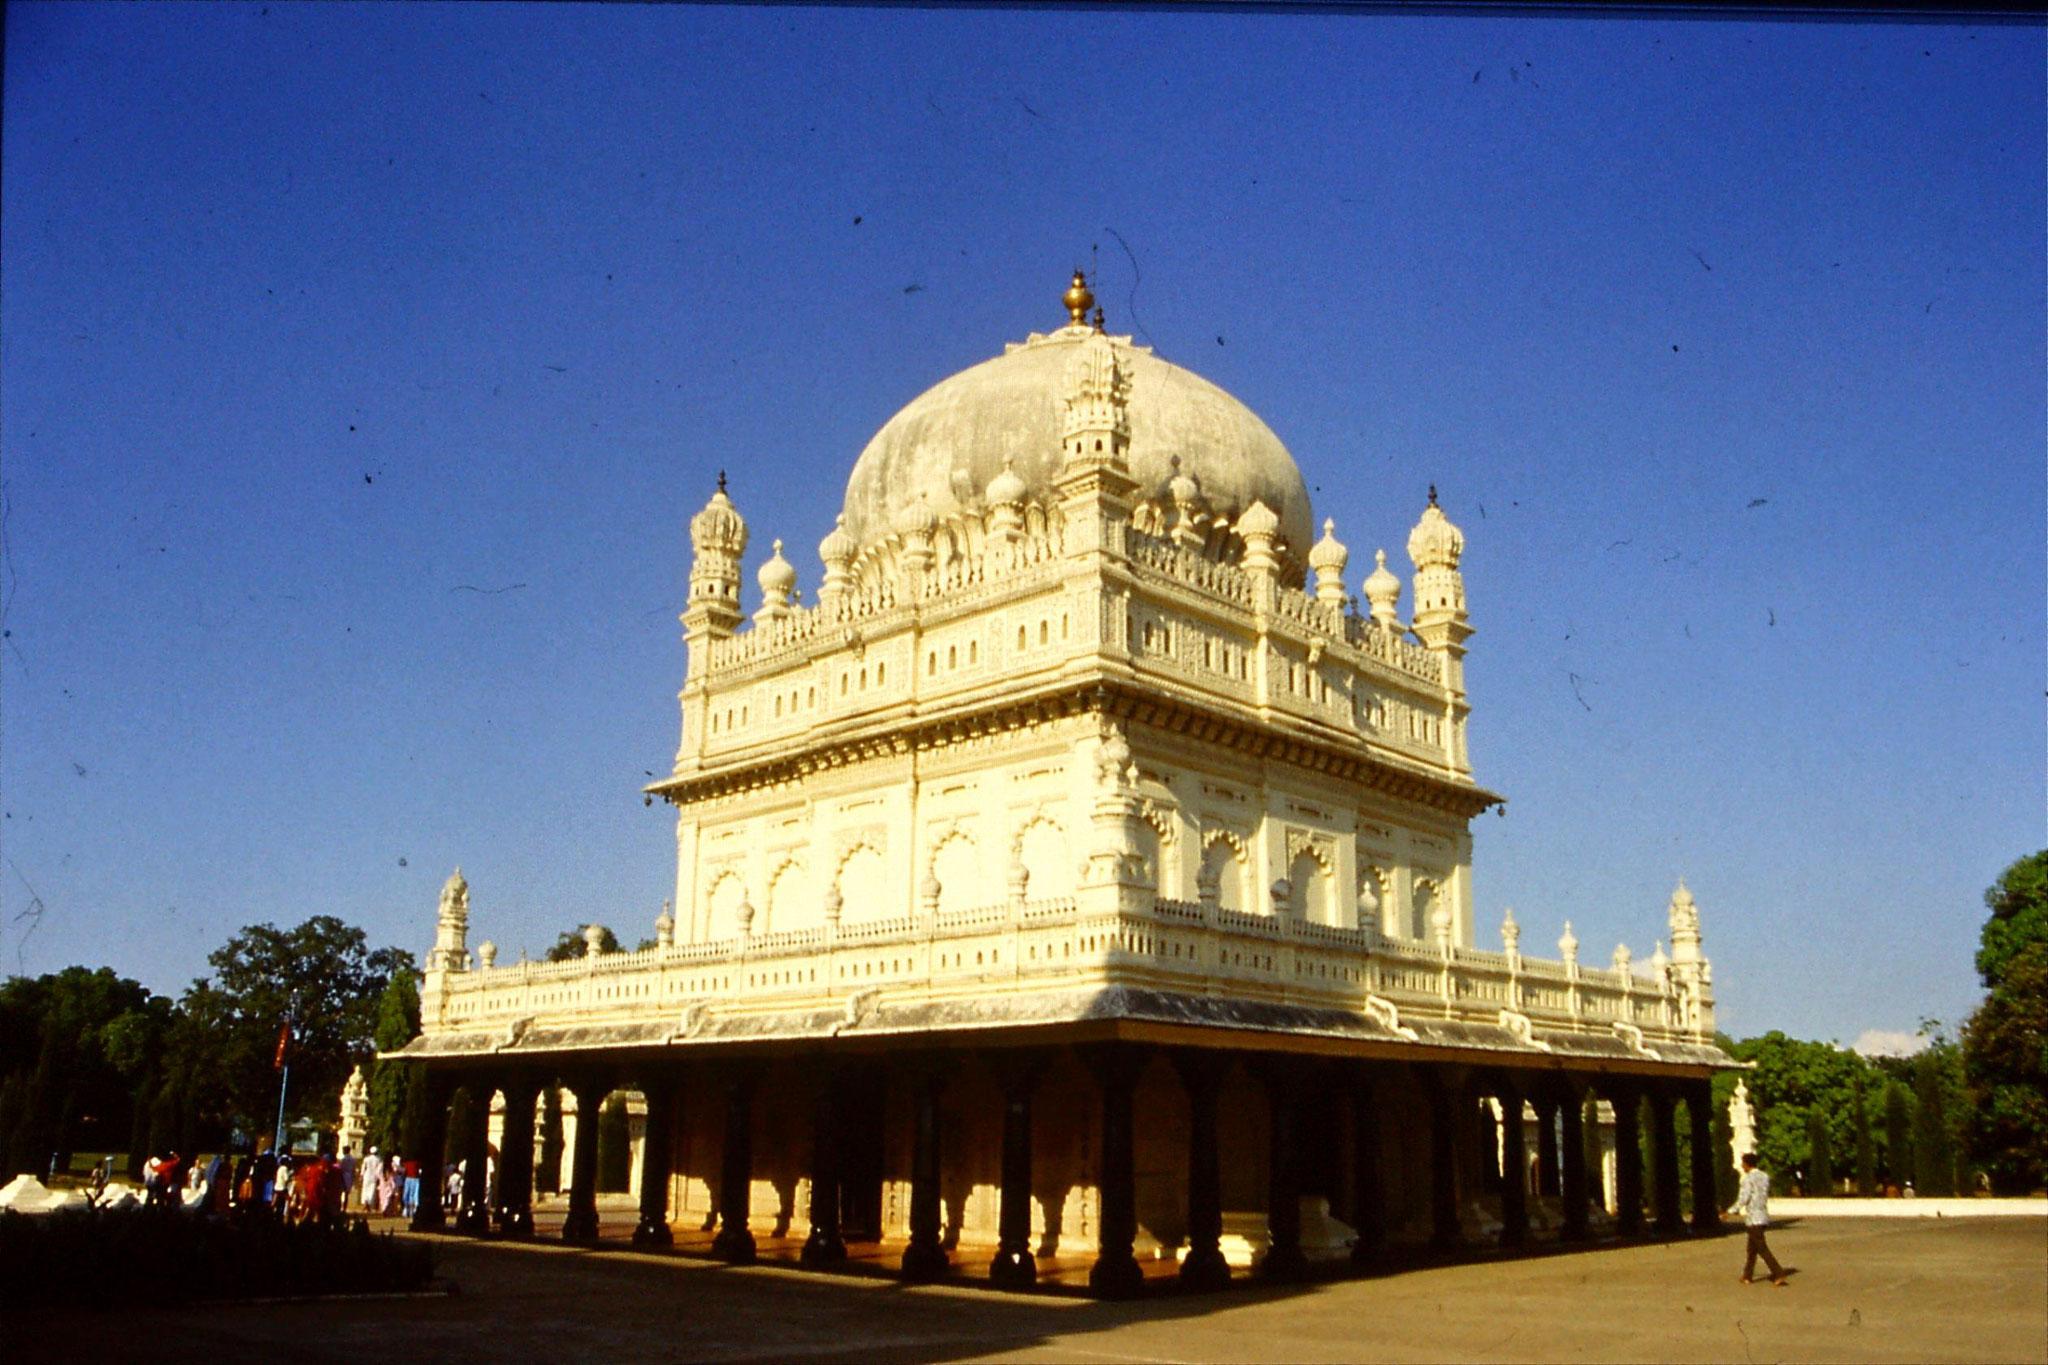 108/7: 12/3/1990 Gumbaz - Haider Ali & wife & Tippu Sultan tombs